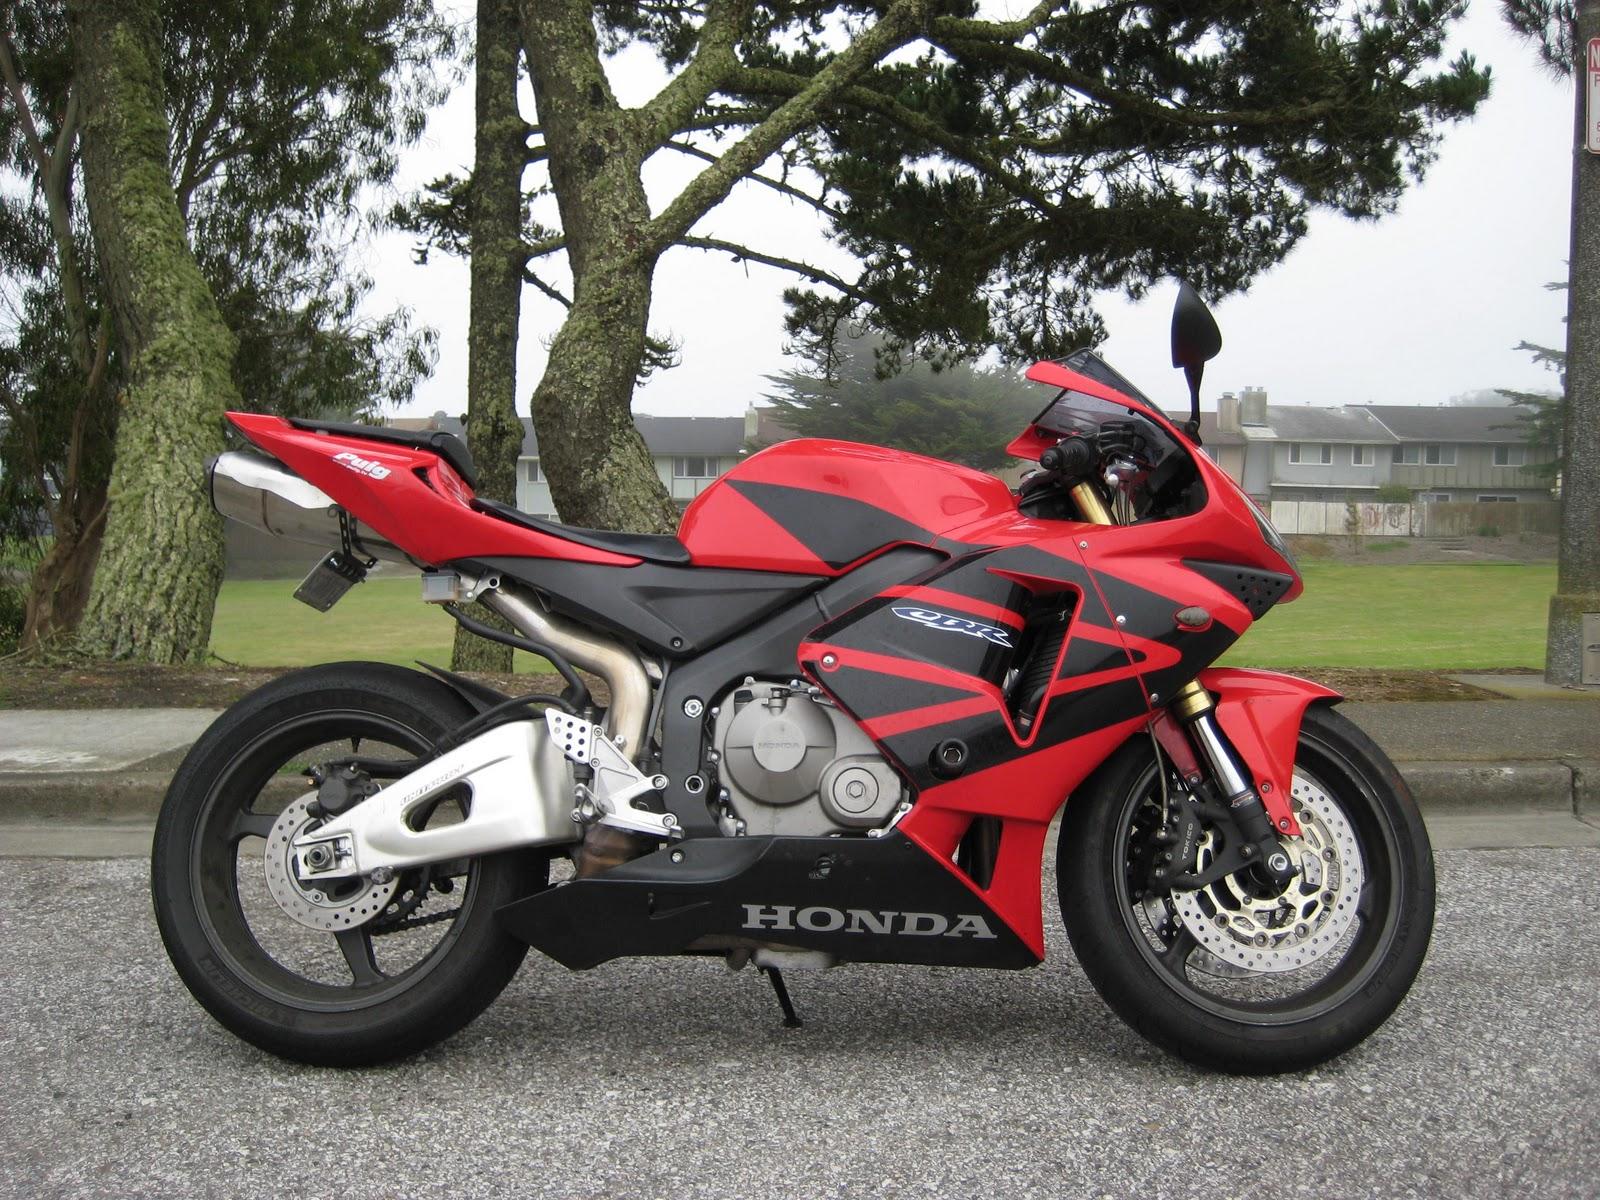 Monsterbiker01 2005 Honda Cbr600rr